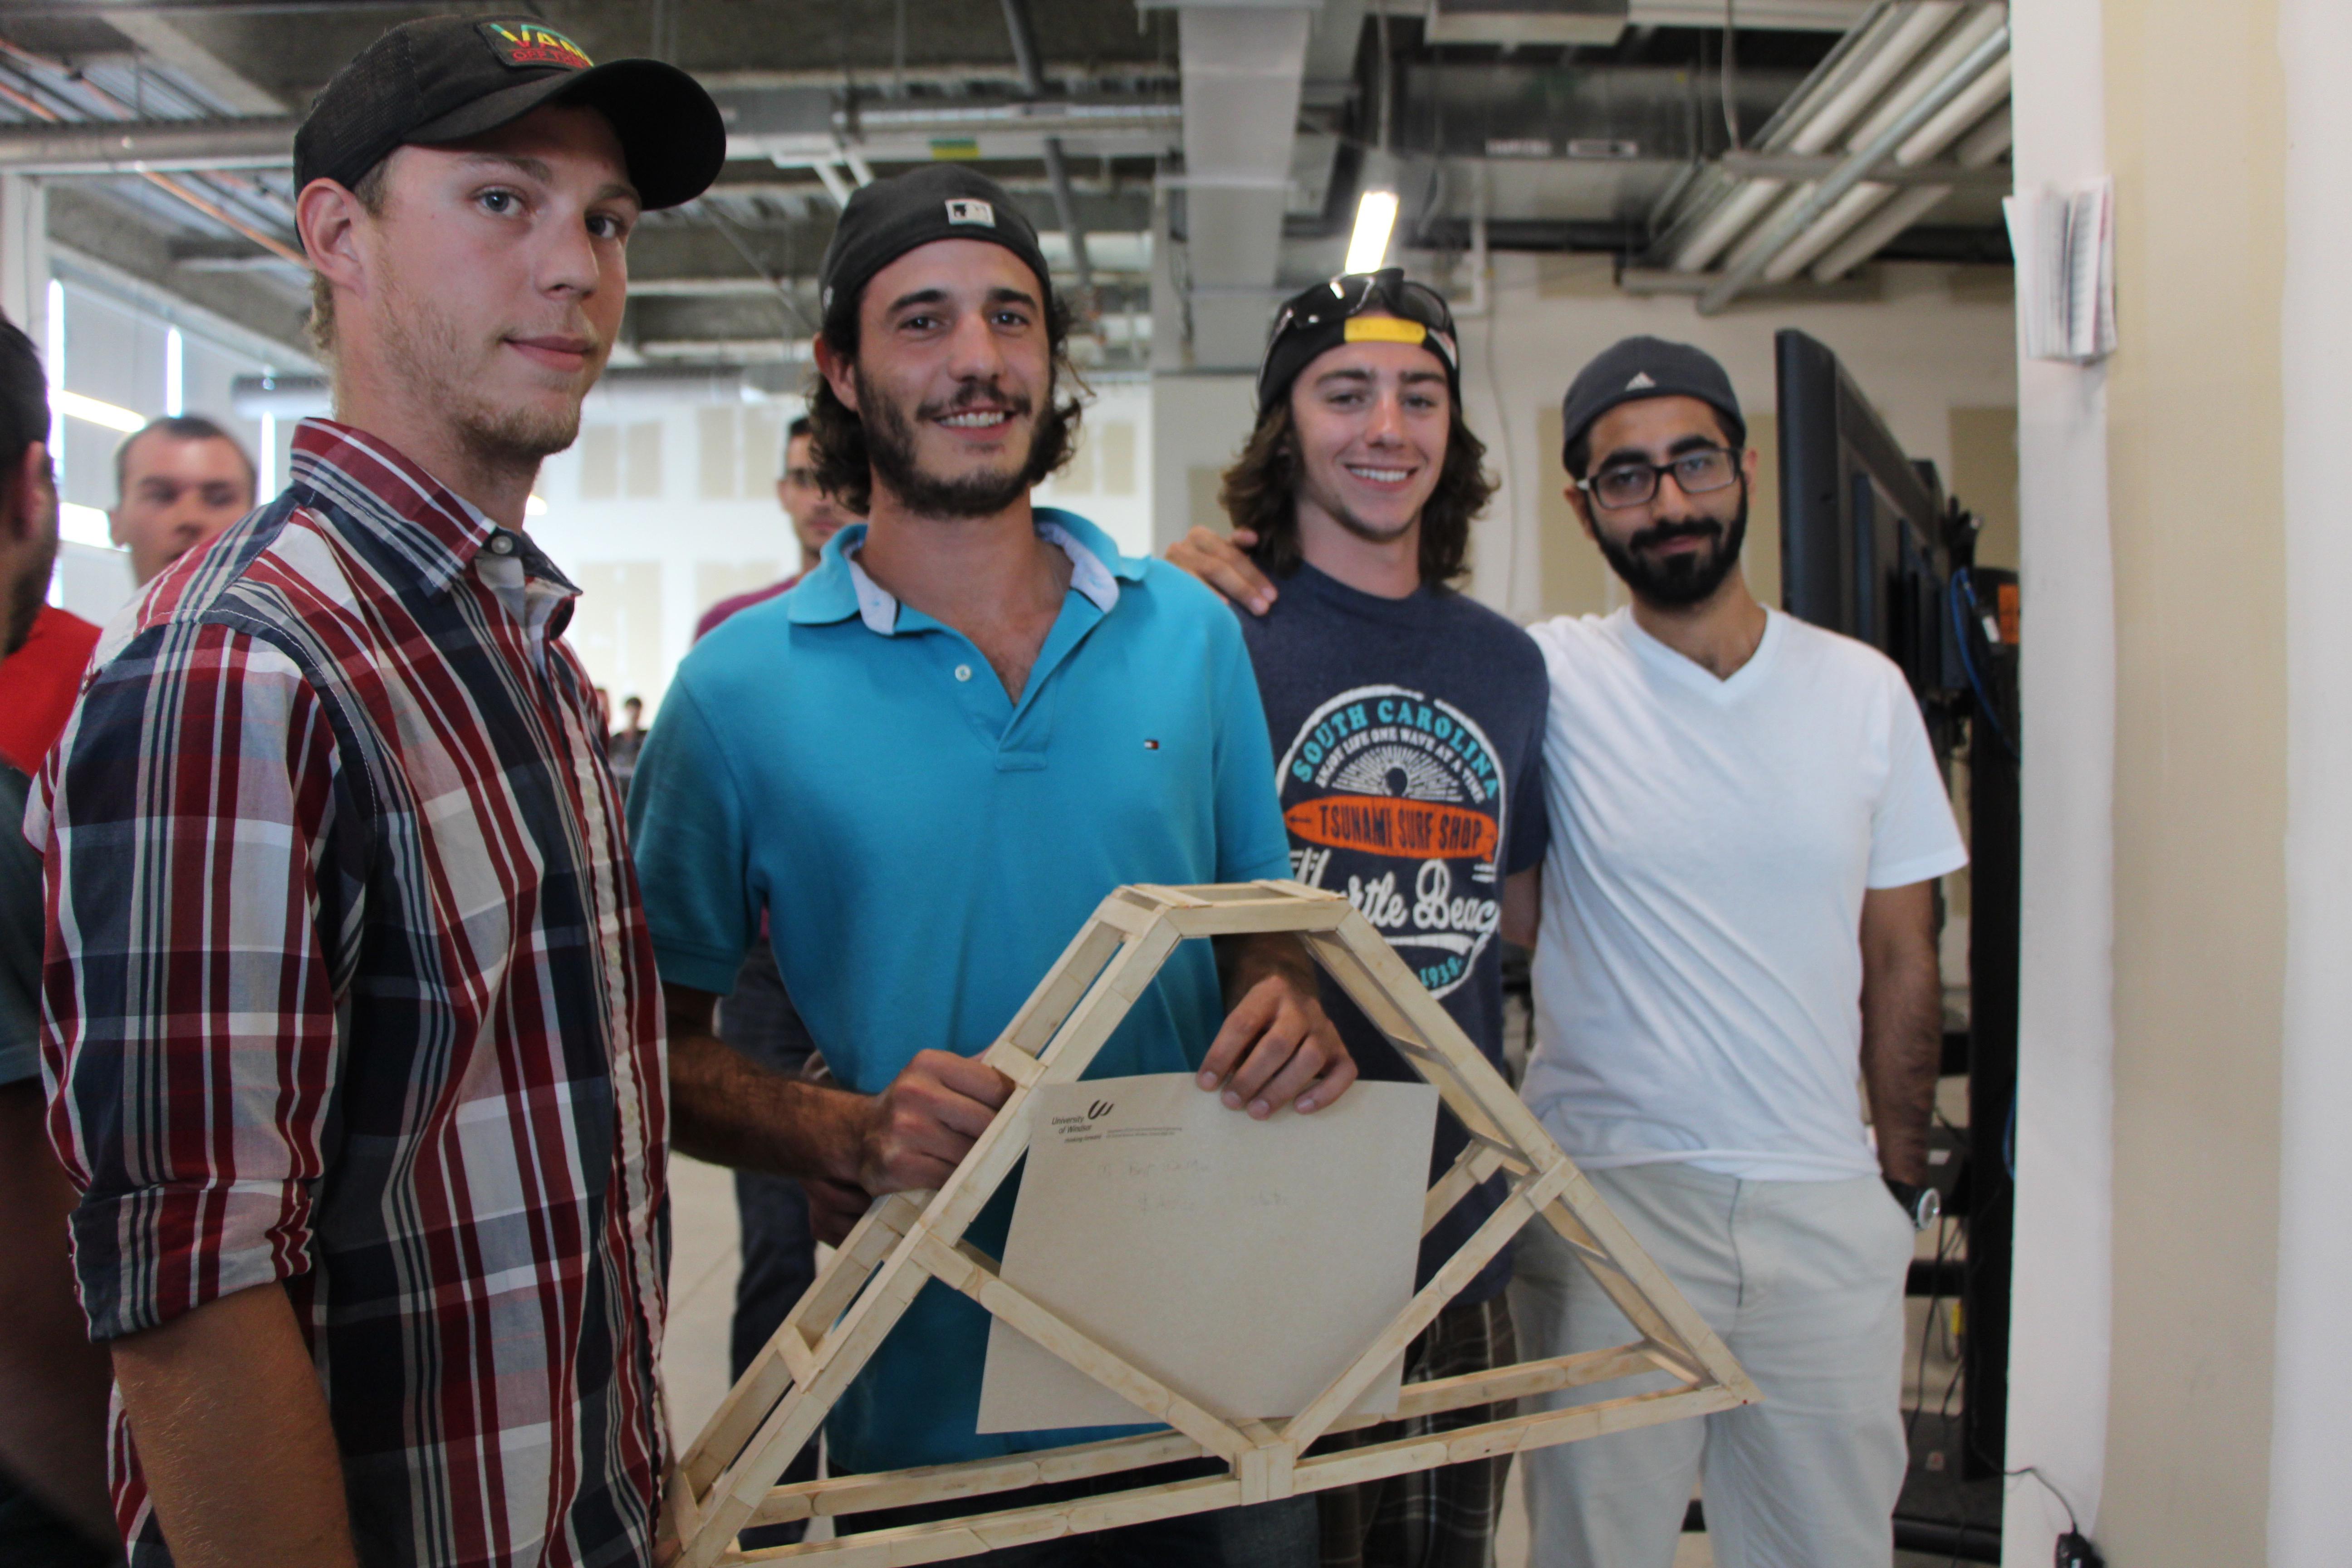 Third year civil engineering students Jordan Gangier, Griffin Cecilaws, Chris Mullin and Ali Taeb display their model bridge, a winner of the best performing bridge